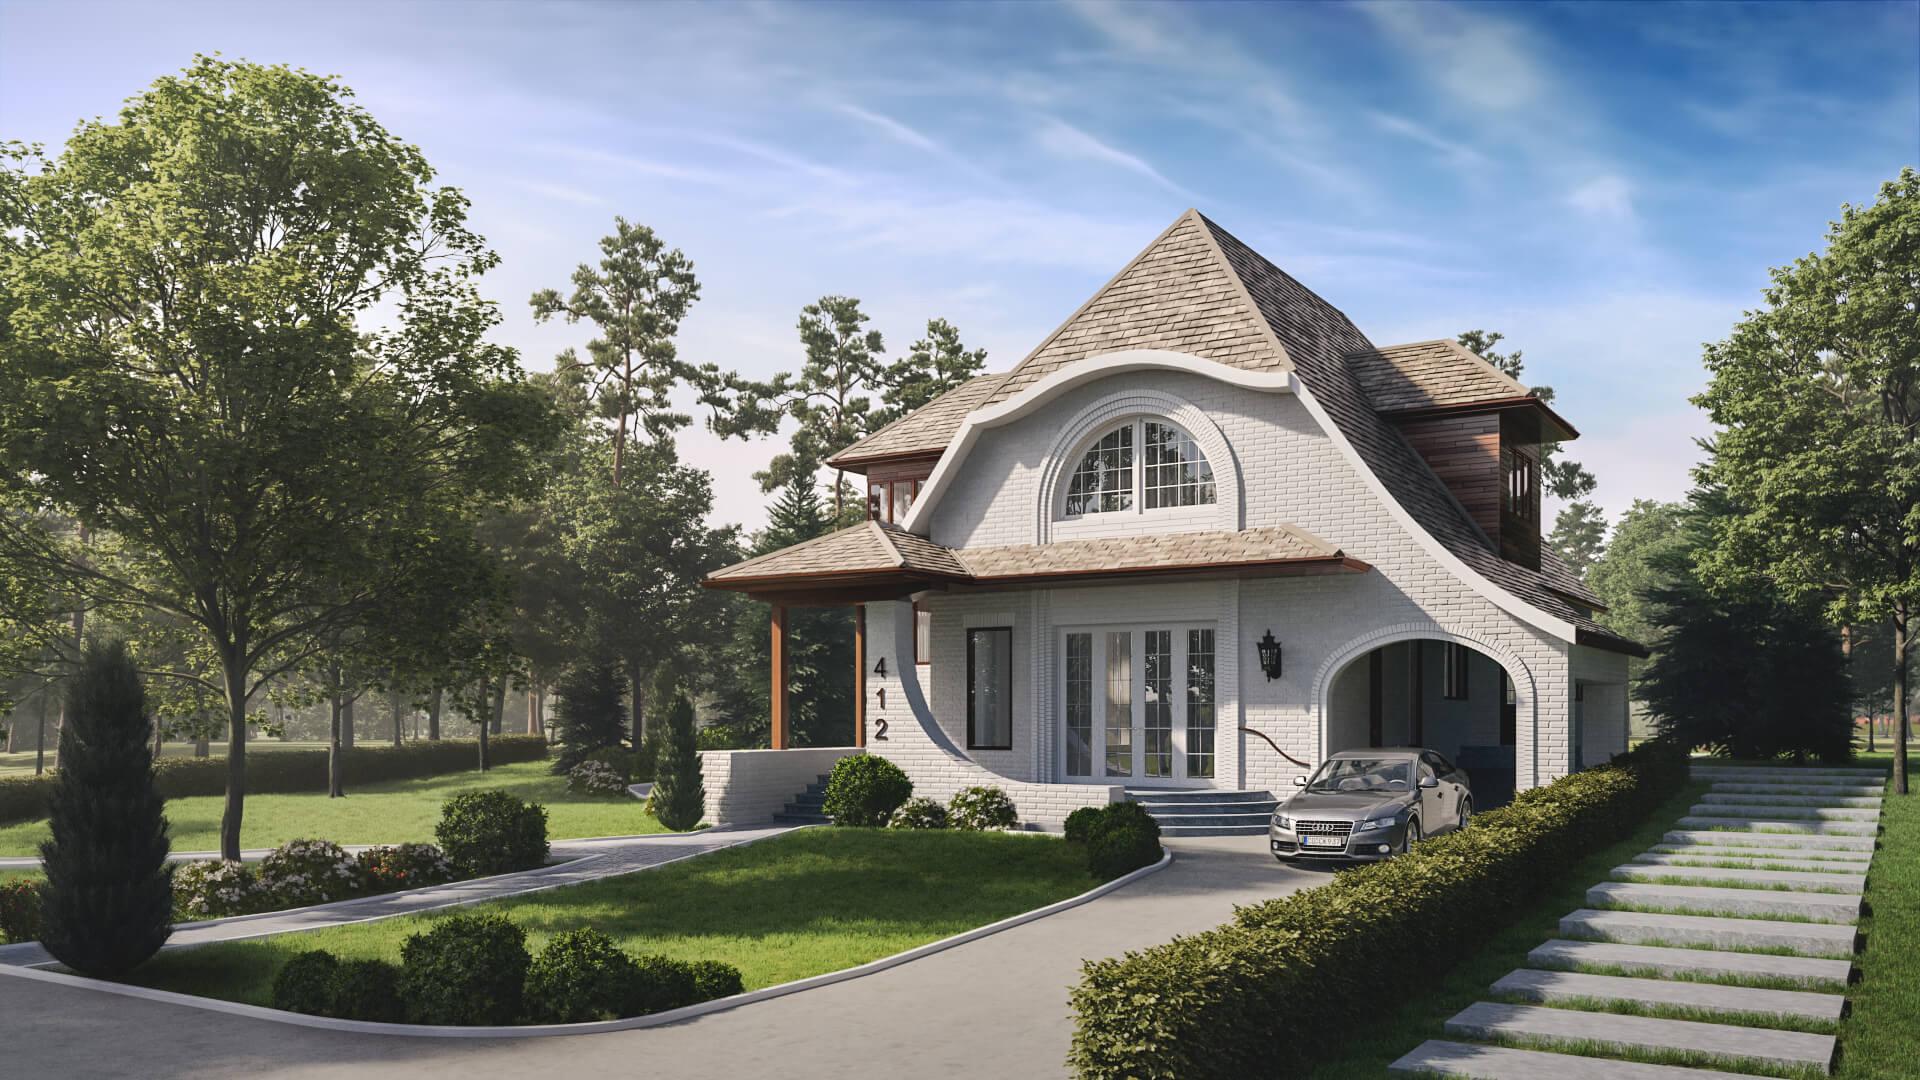 Stylish House Residential Visualization